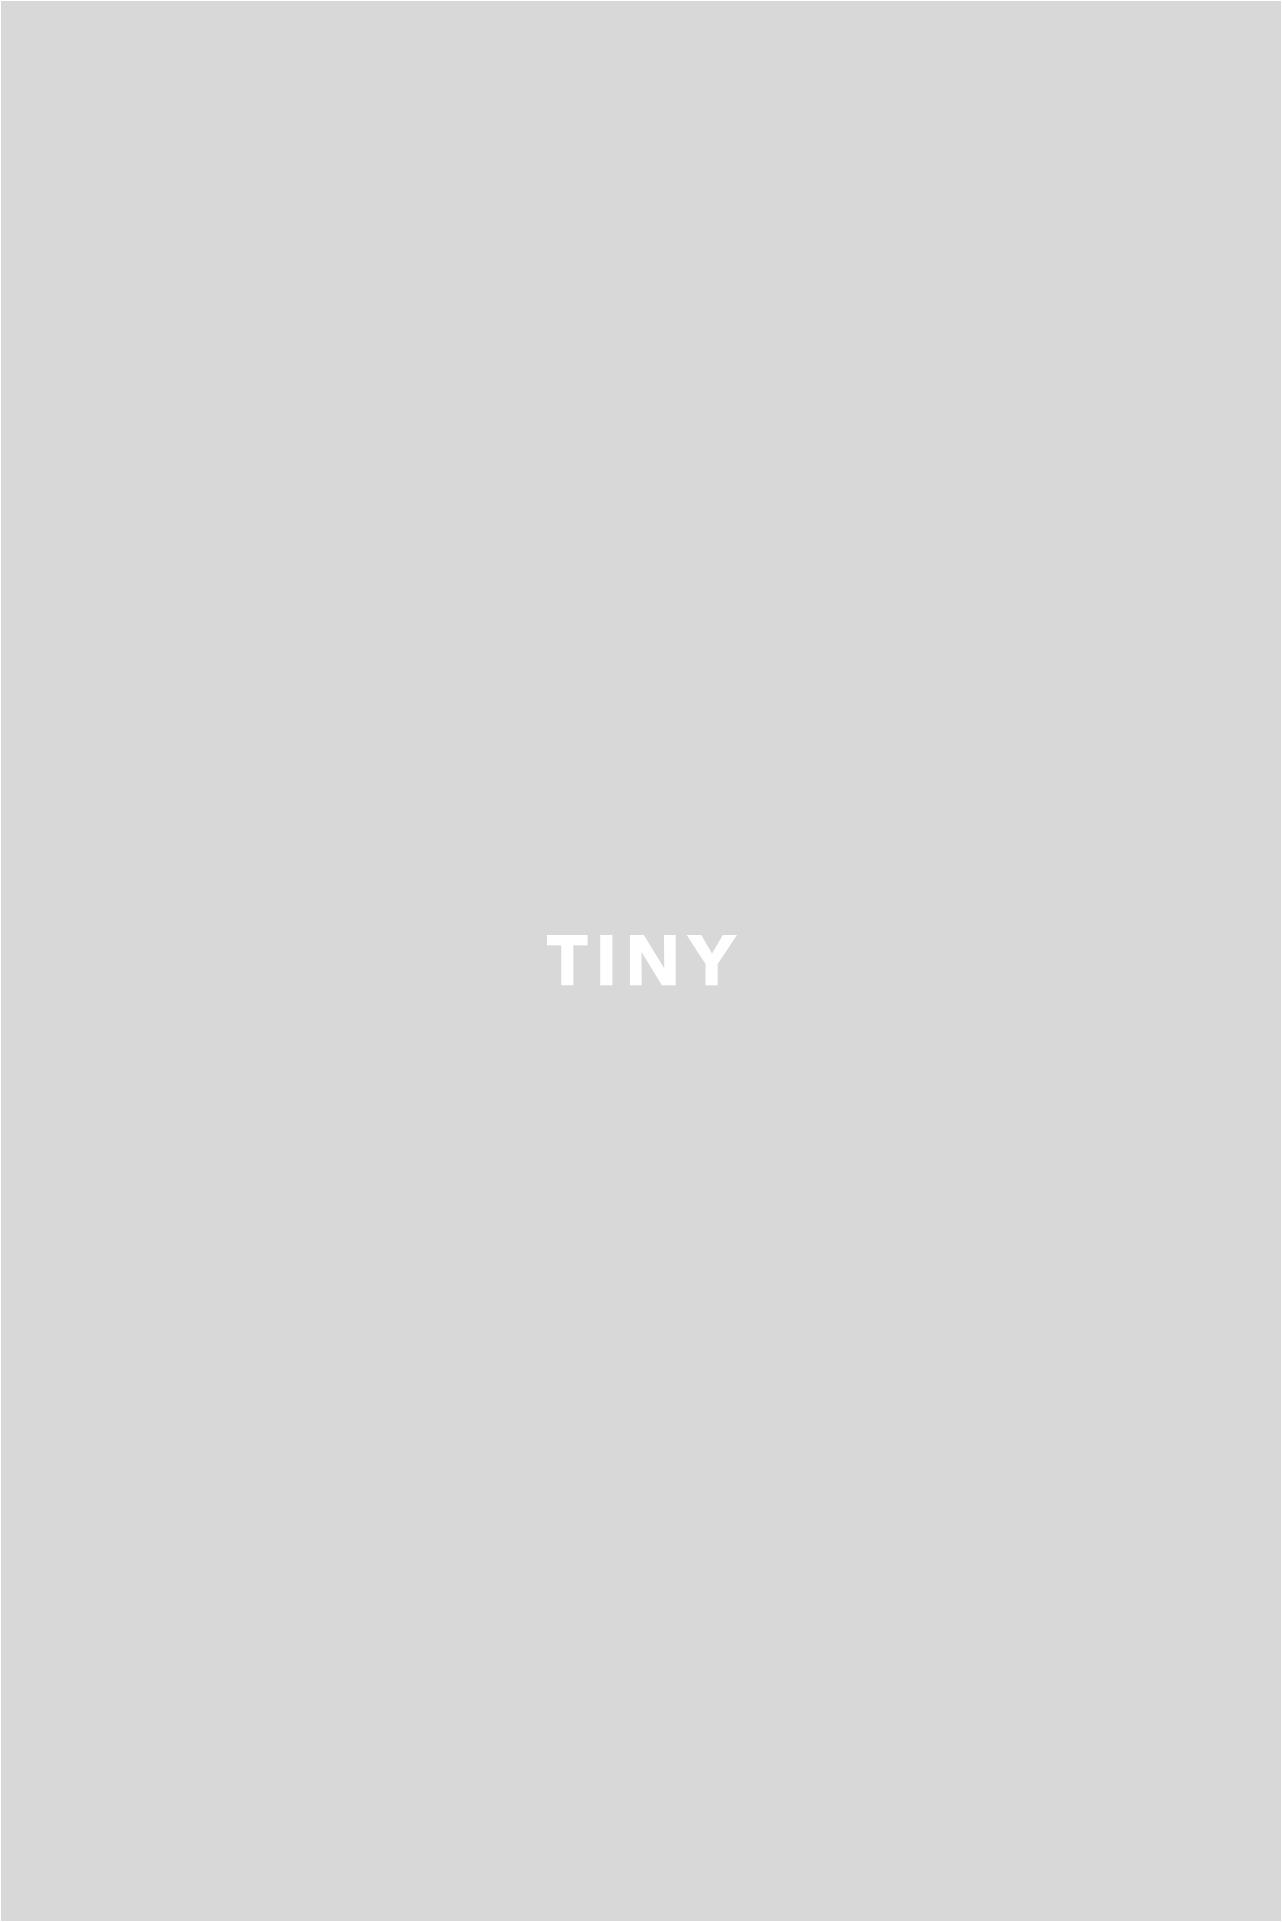 IZIPIZI ADULT D SUN Tortoise Green Lenses +0